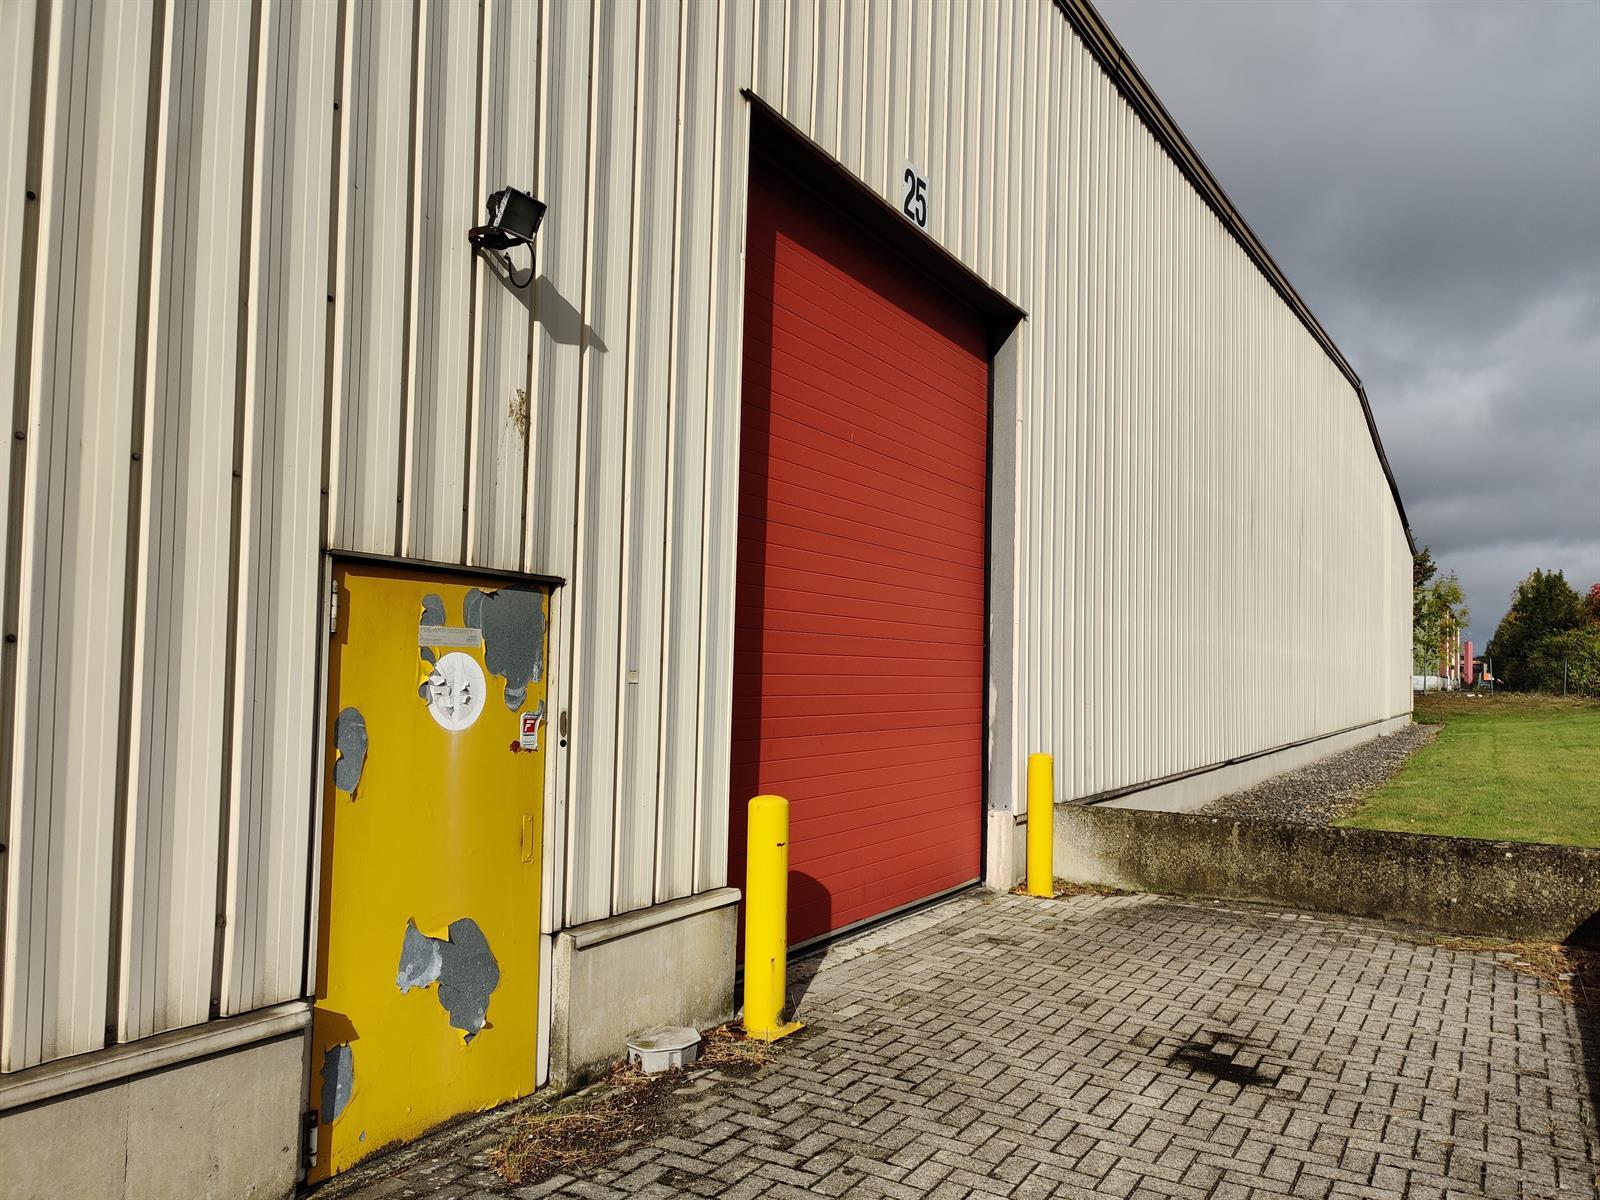 gebouw voor gemengd gebruik te huur I173 - Quatrieme Rue , 6040 Charleroi Jumet, België 5